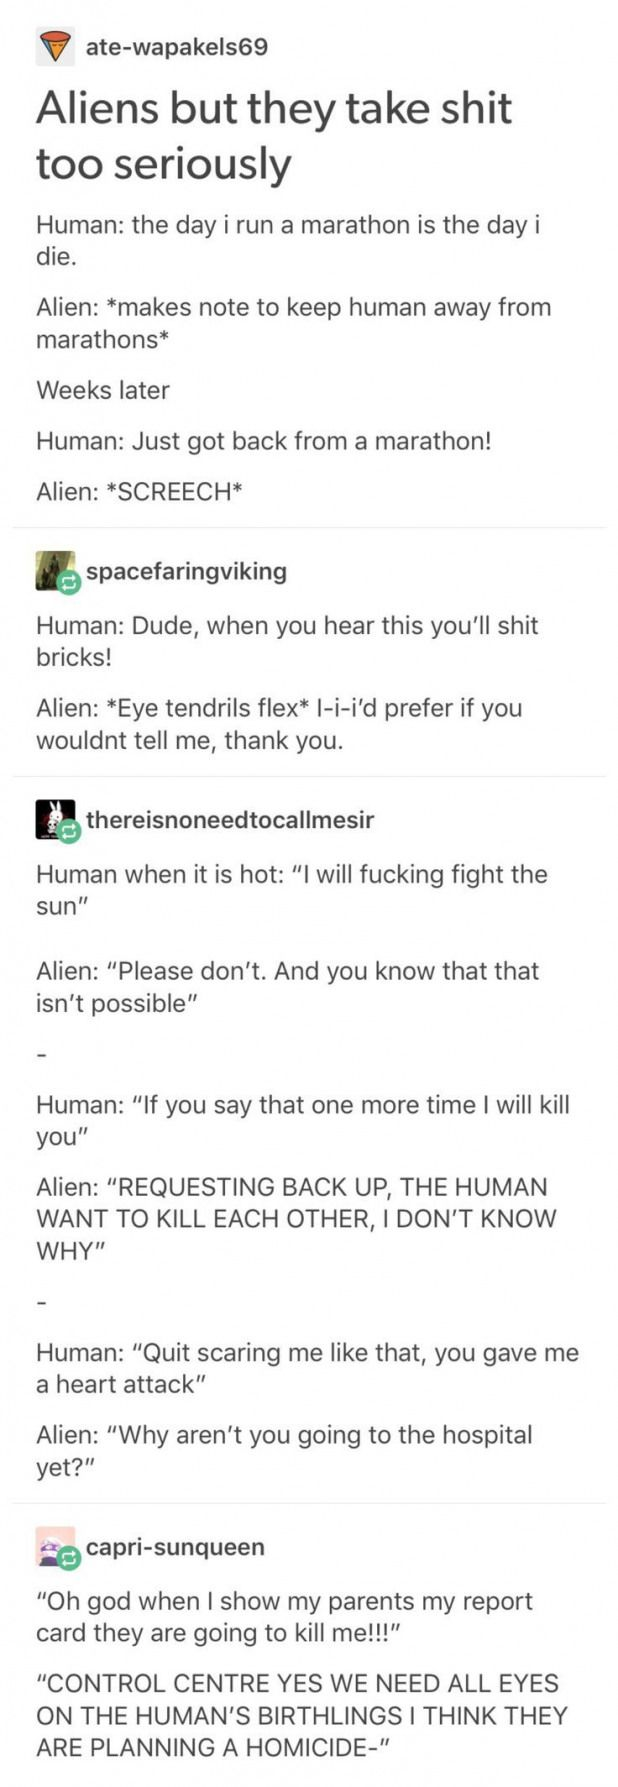 Cute Jokes These Aliens Are Talking My Lan Cutejokes Humour Memes Aliens Cute Cutejokes Cutejokesforkids Cutejoke Cute Jokes Tumblr Funny Writing